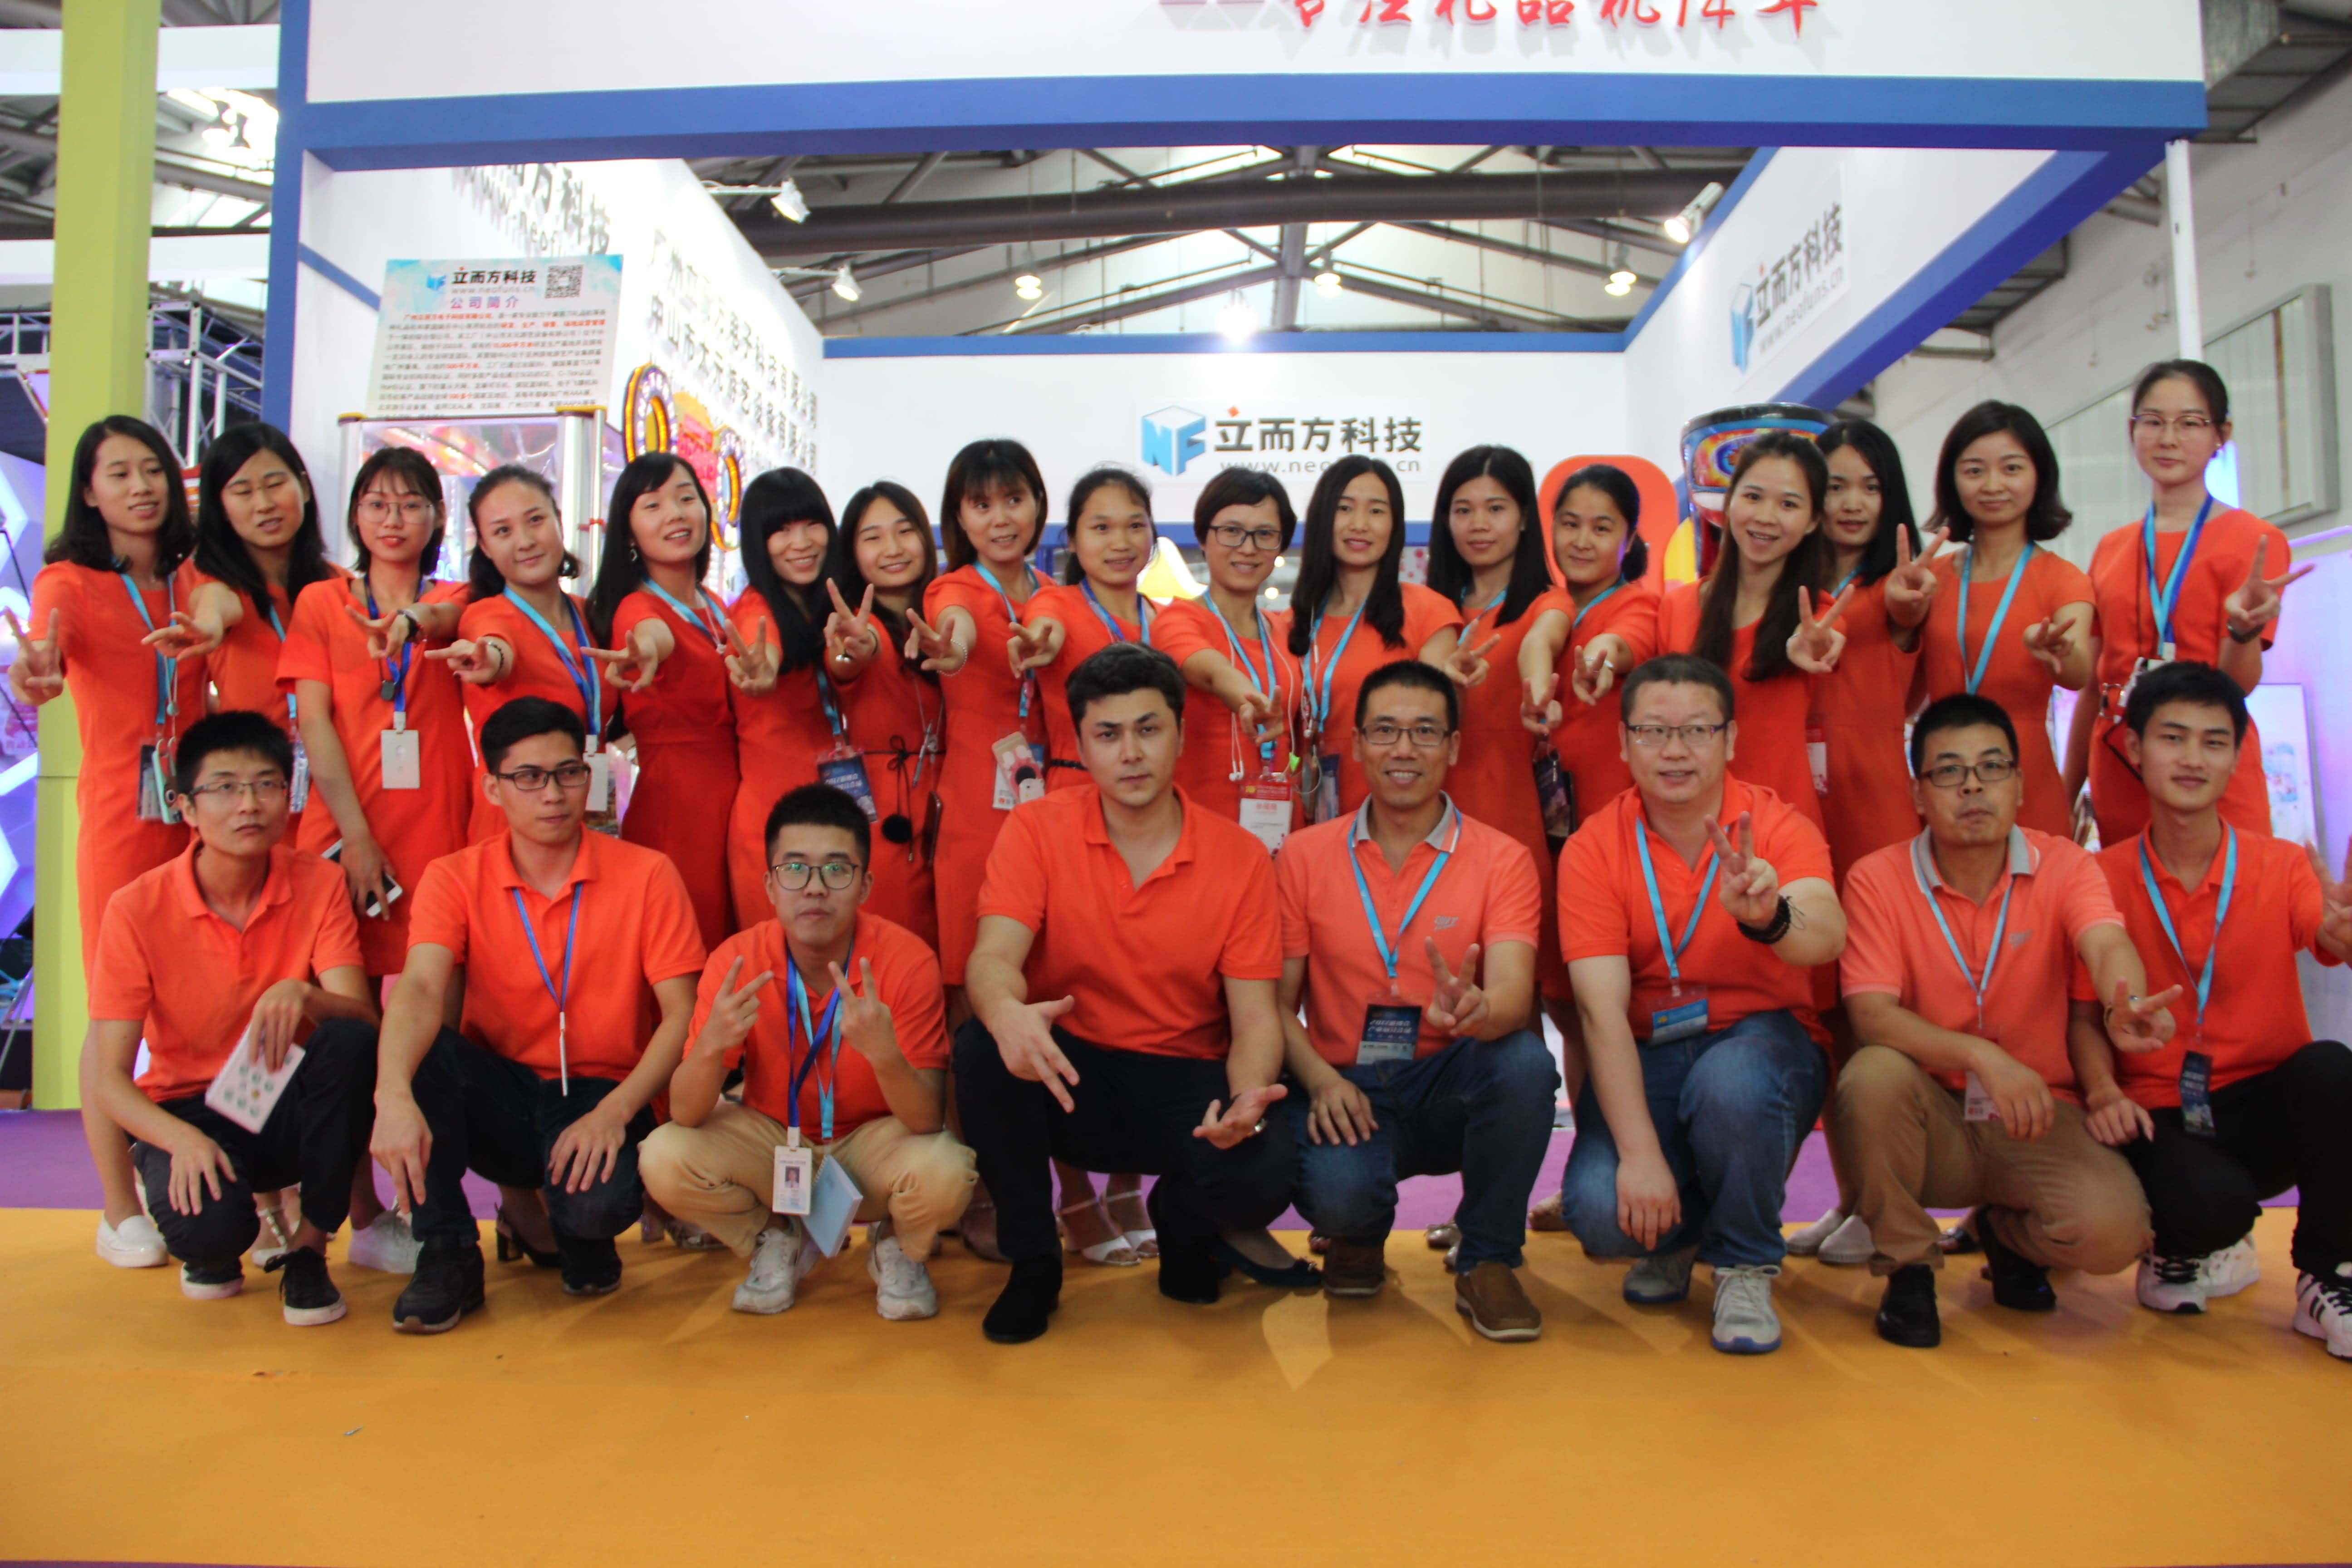 Neofuns in China Int'l Games & Amusement Fair 2017